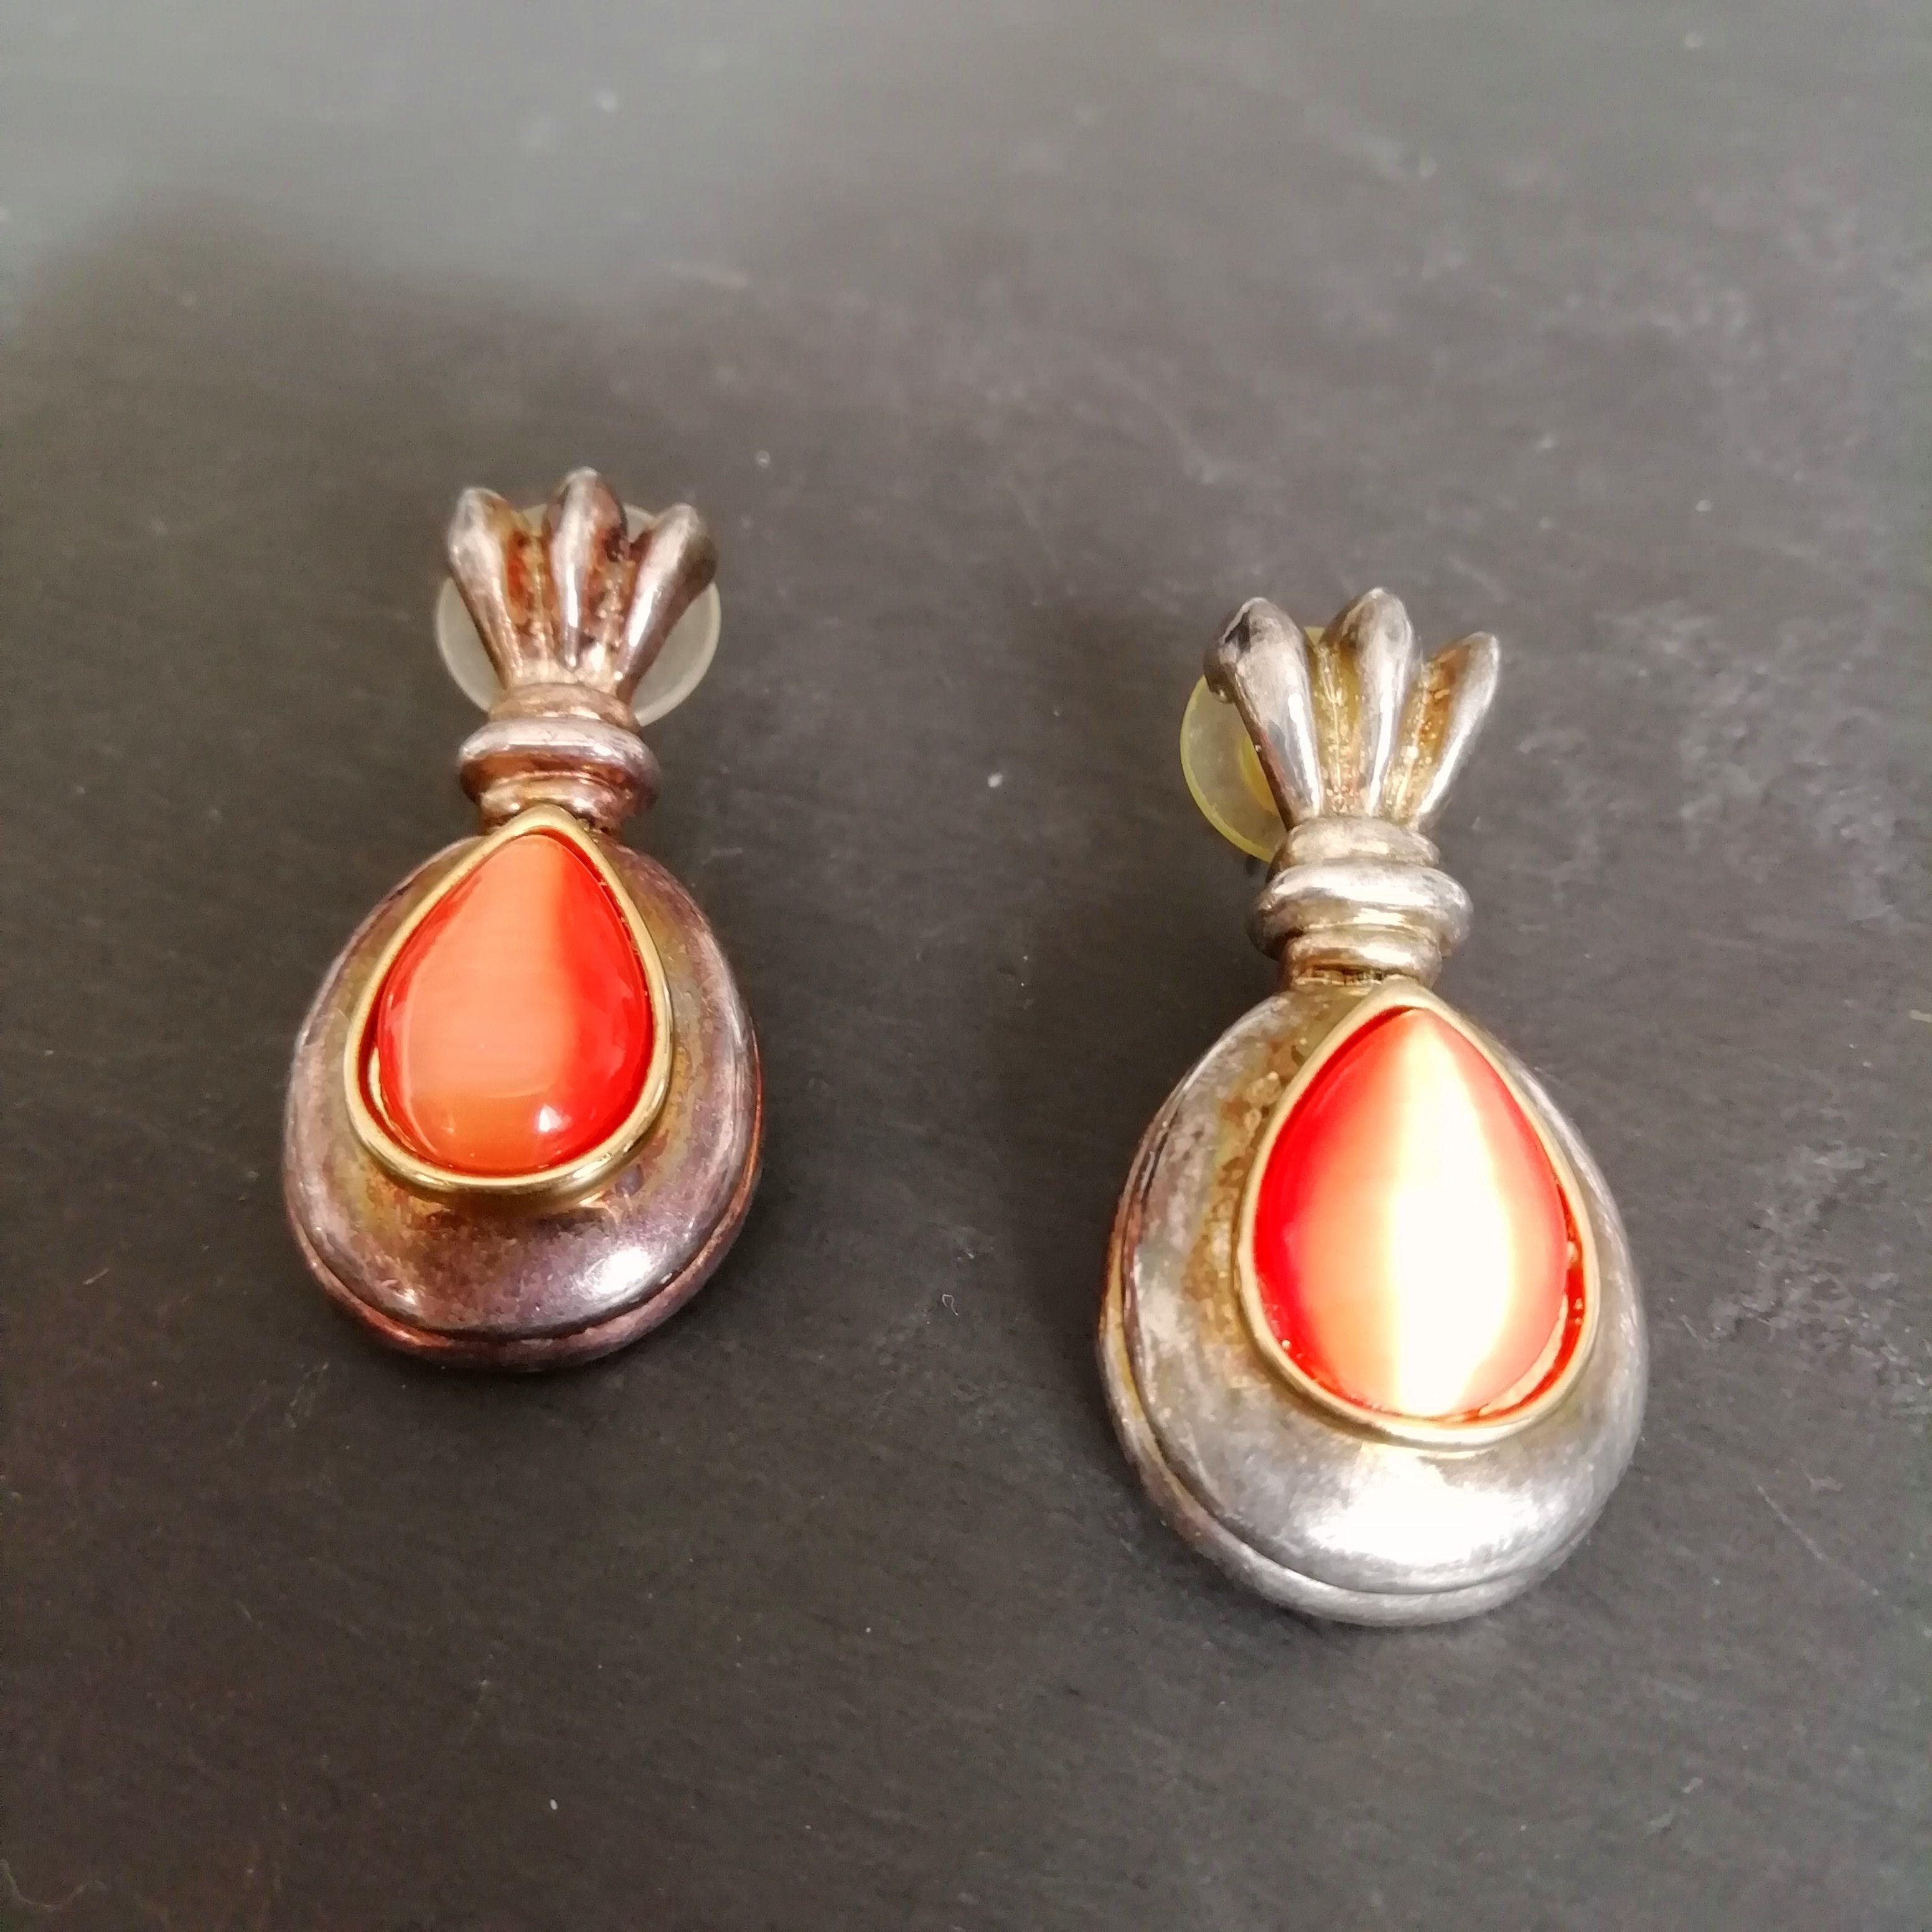 Moonglow orange stone nineties pierced ear earrings Silver plated large vintage earrings STATEMENT 90s orange EARRINGS